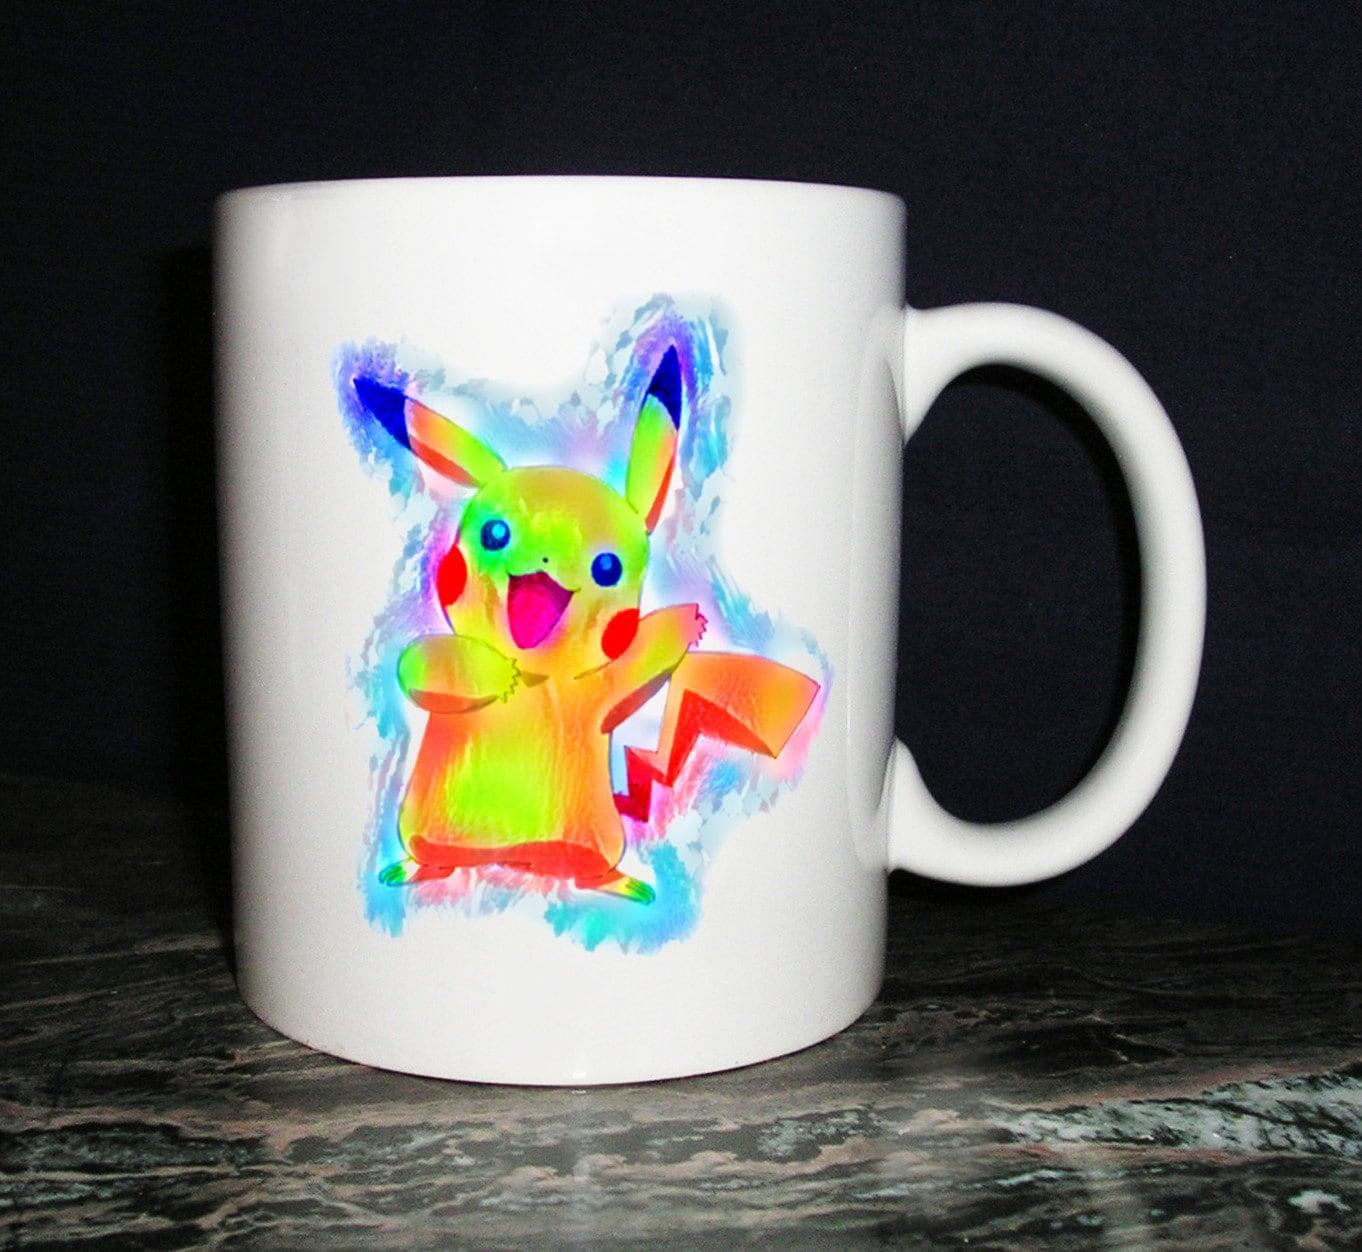 Pikachu Pokemon Themed Coffee Mug